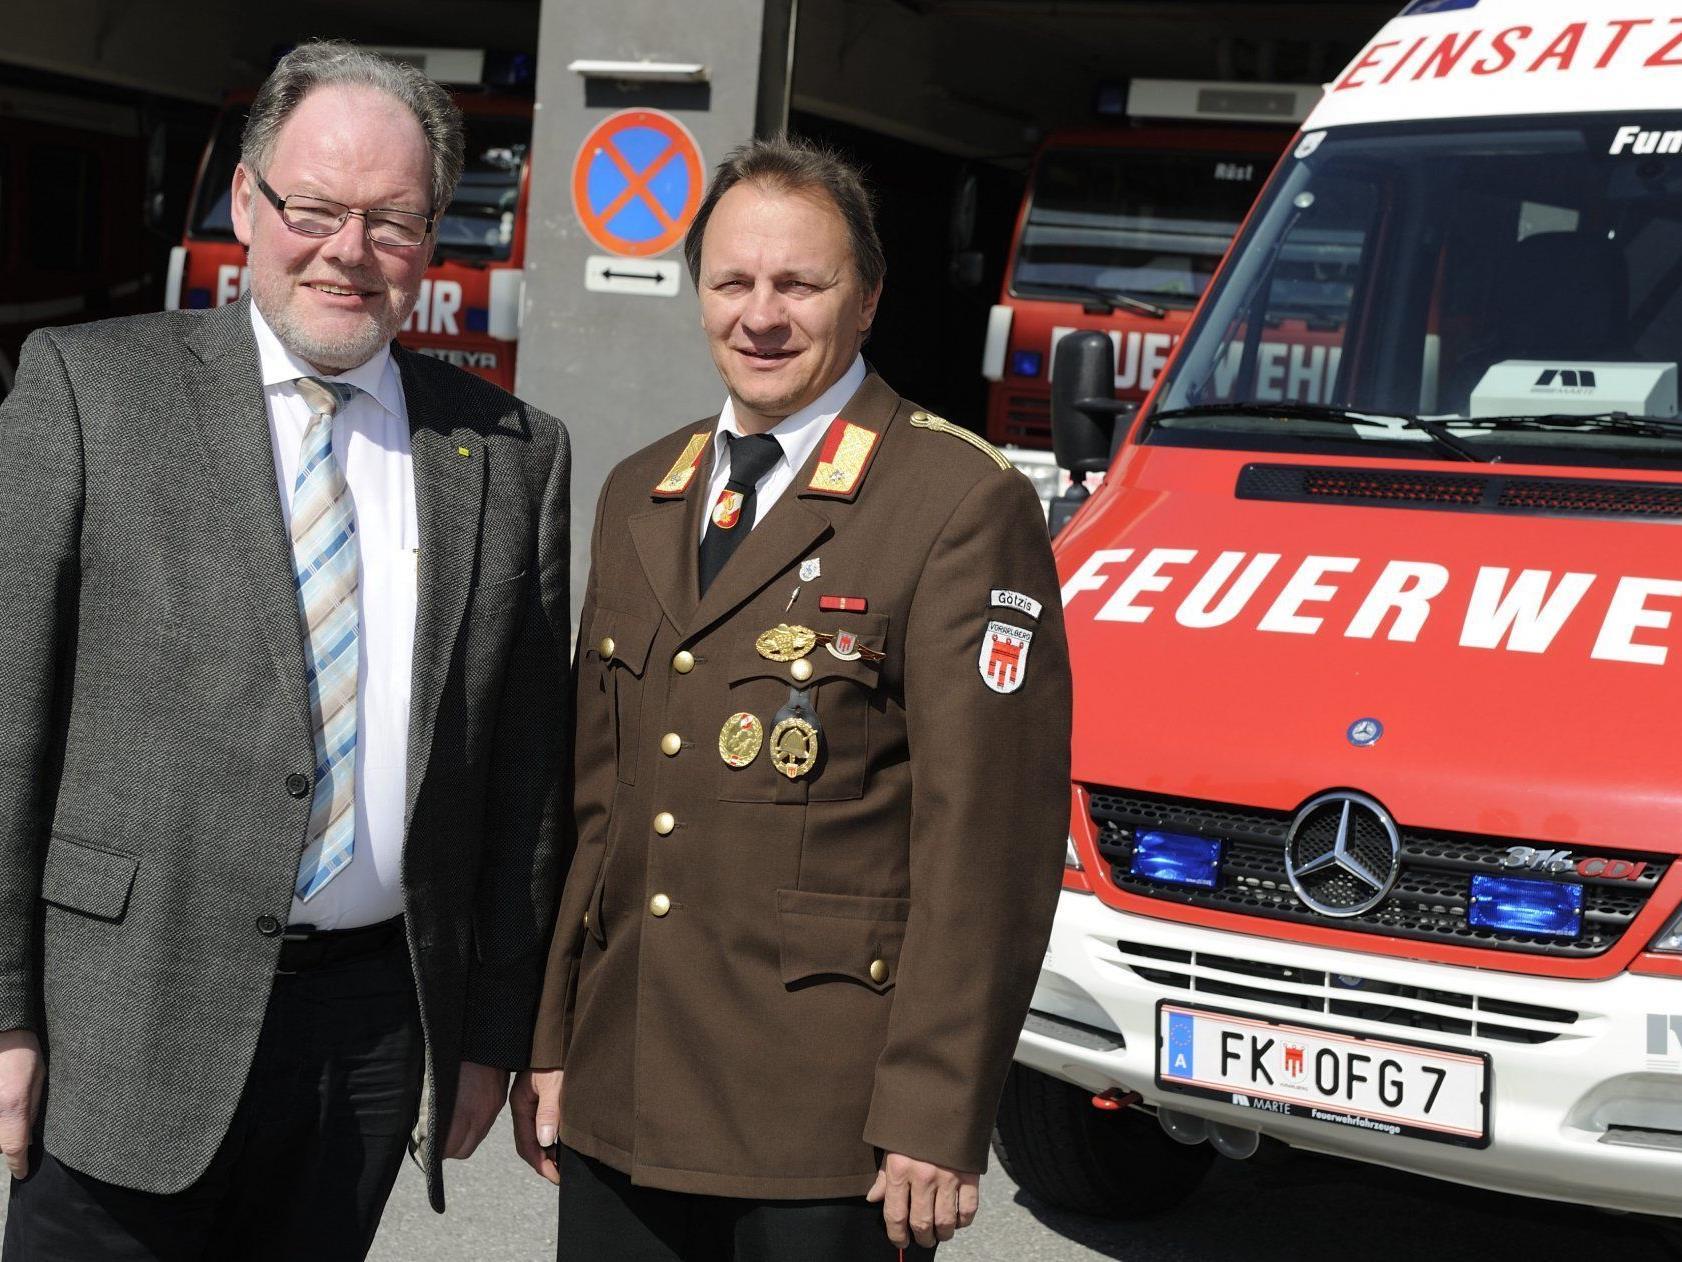 Bürgermeister Werner Huber mit Feuerwehrkommandant Eugen Böckle.